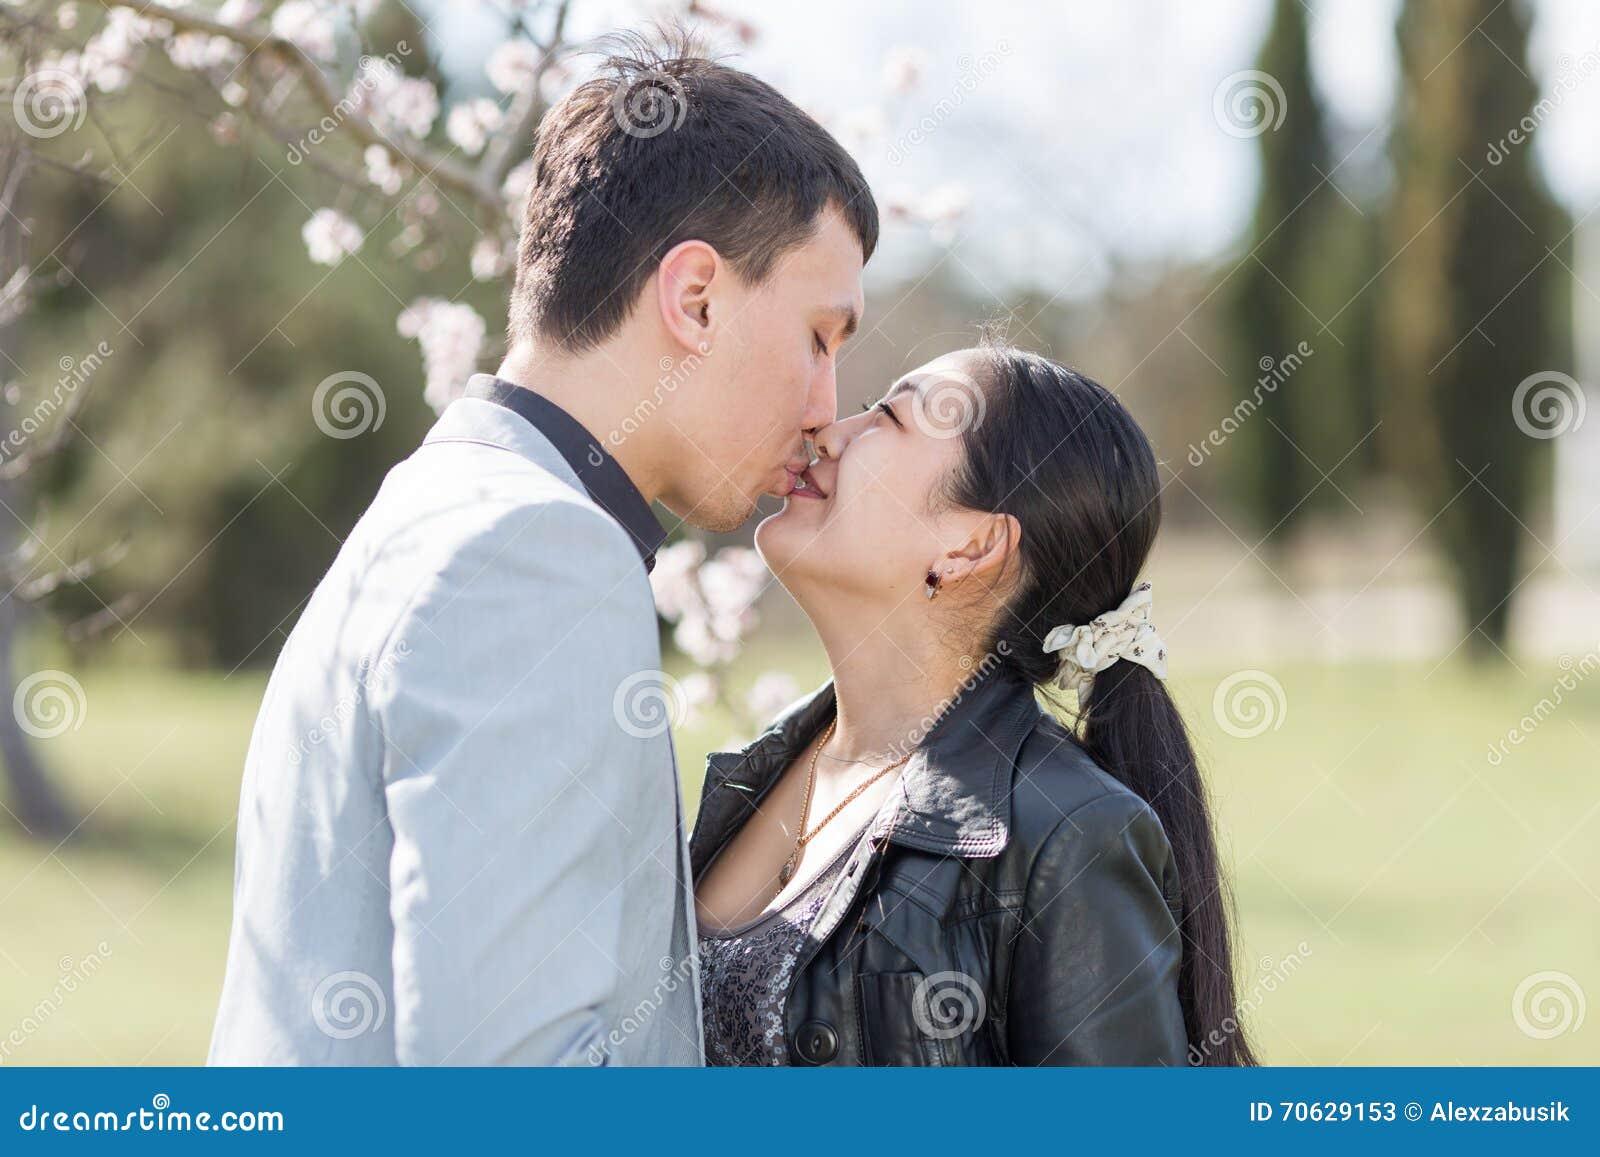 Kissing asian teen kissing asian